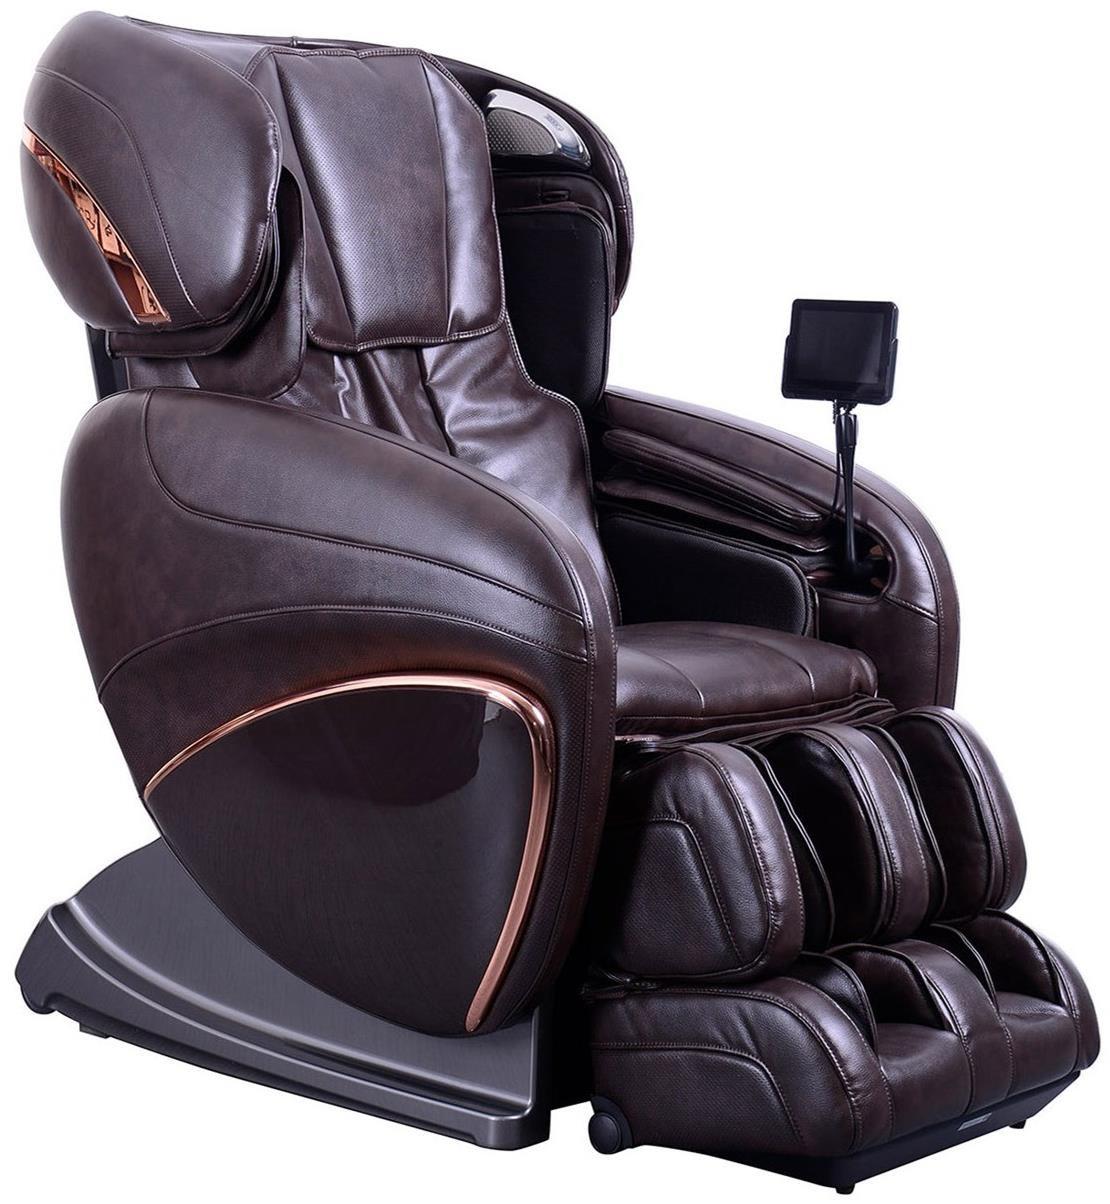 CZ CZ-630 3D Power Reclining 3D Massage Chair by Cozzia at Morris Home